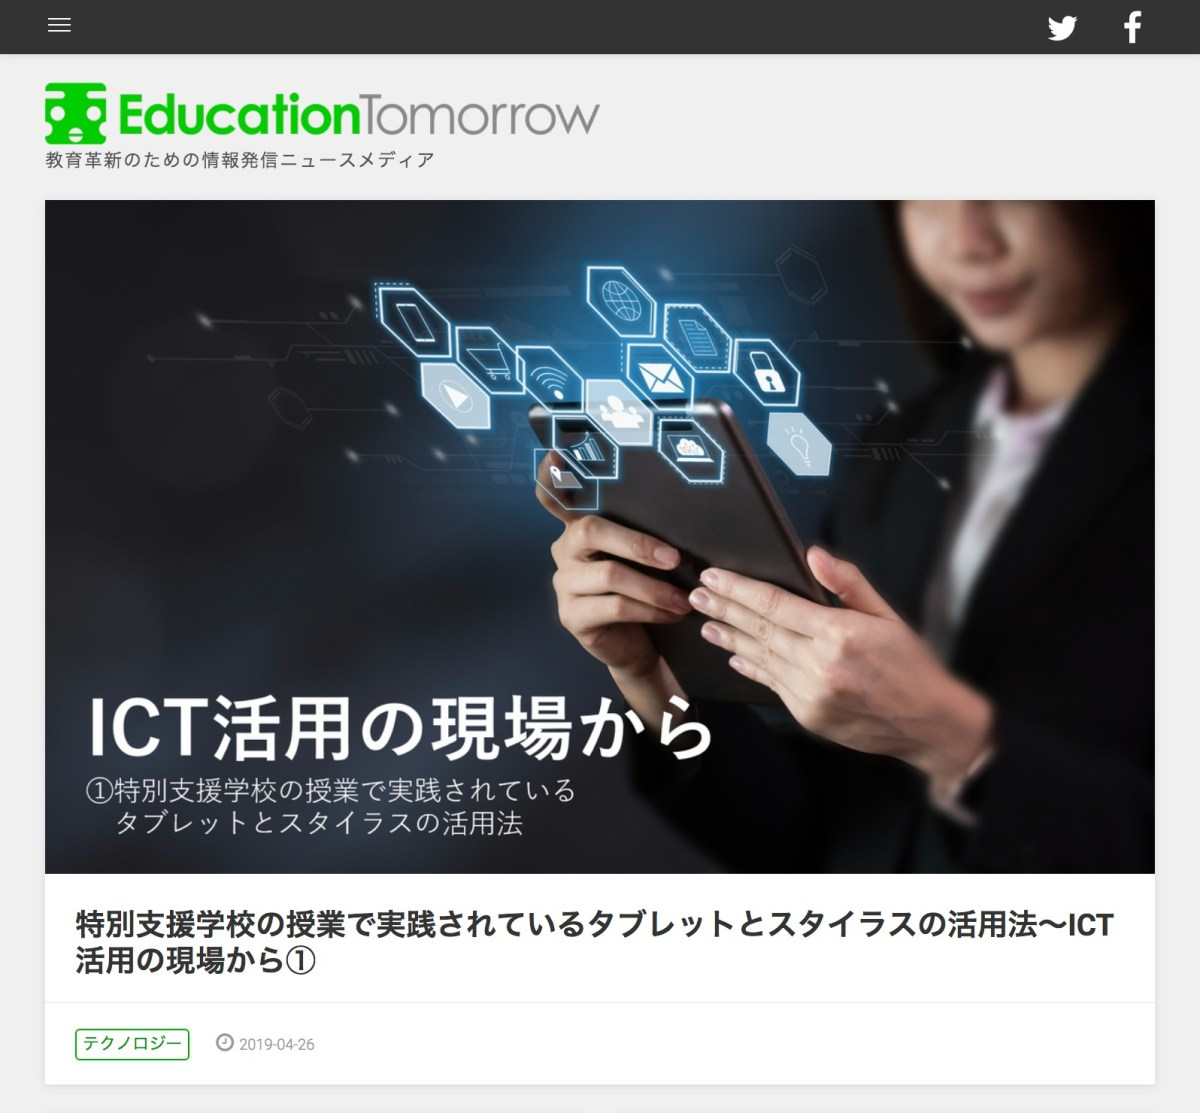 Education Tomorrow